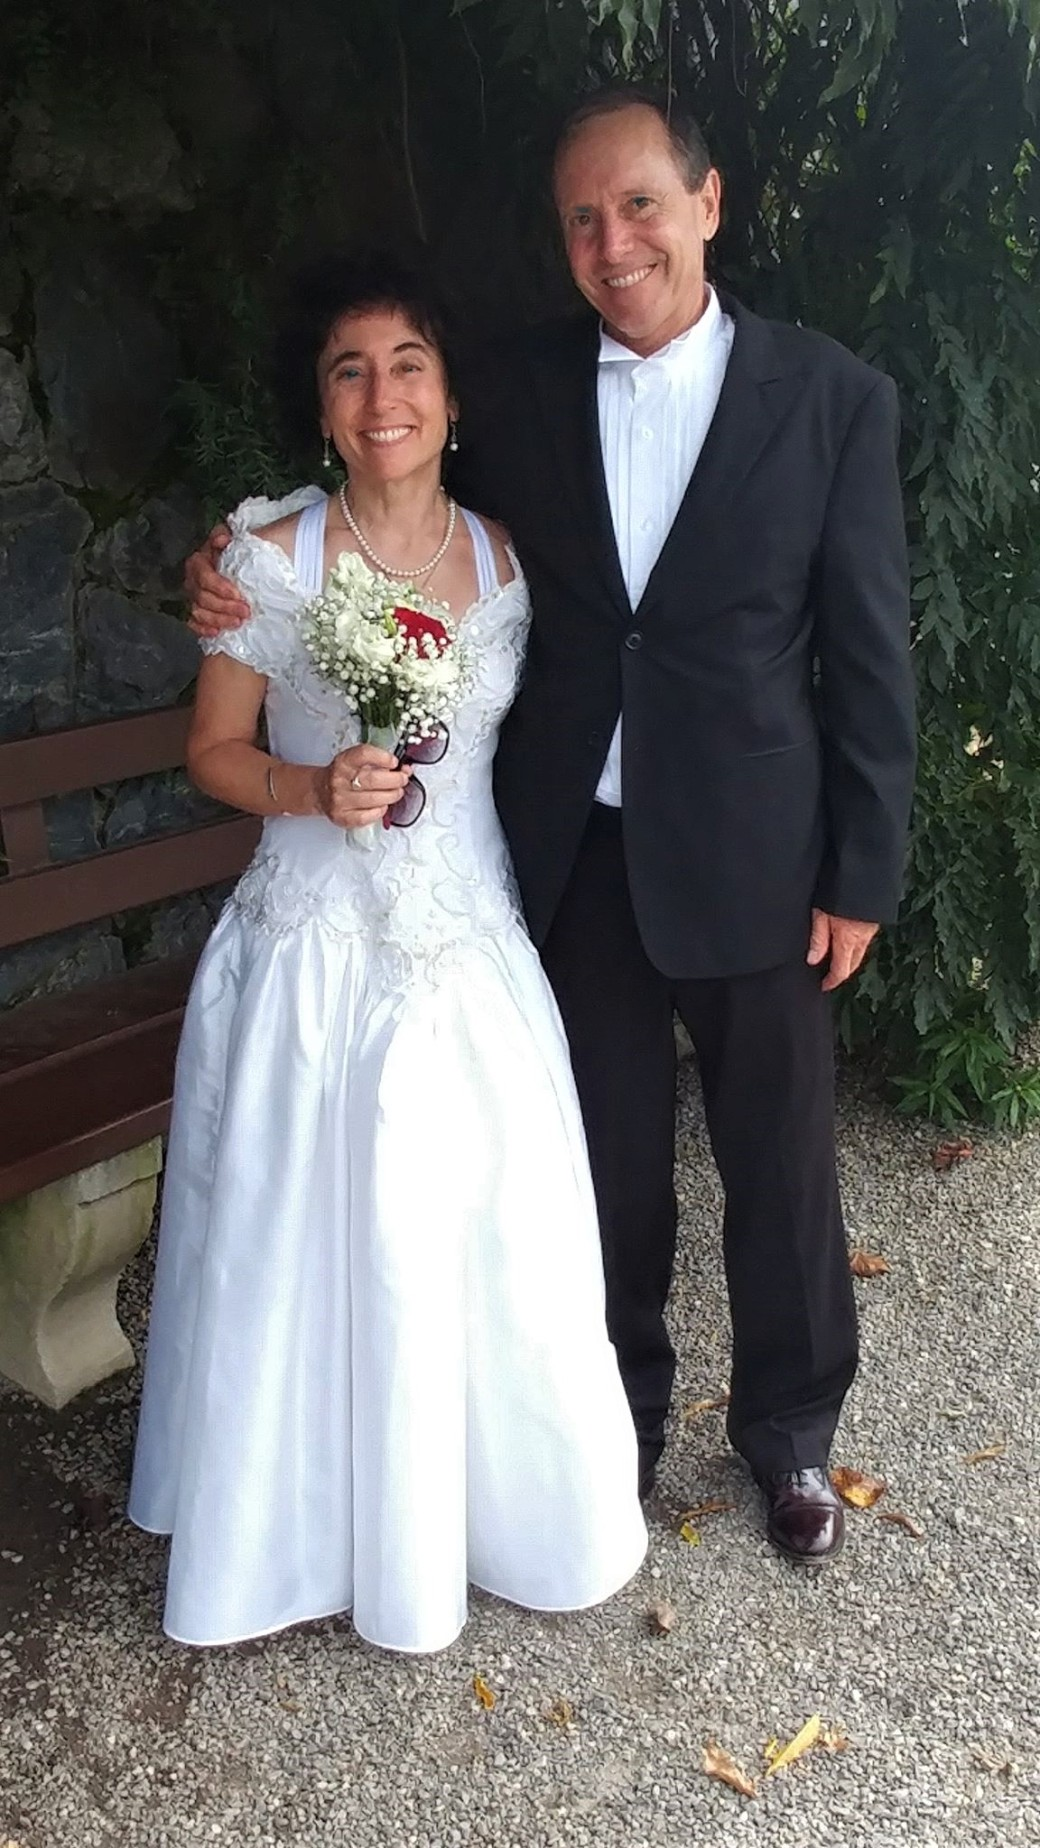 10th Anniversary Wedding Day 8182017